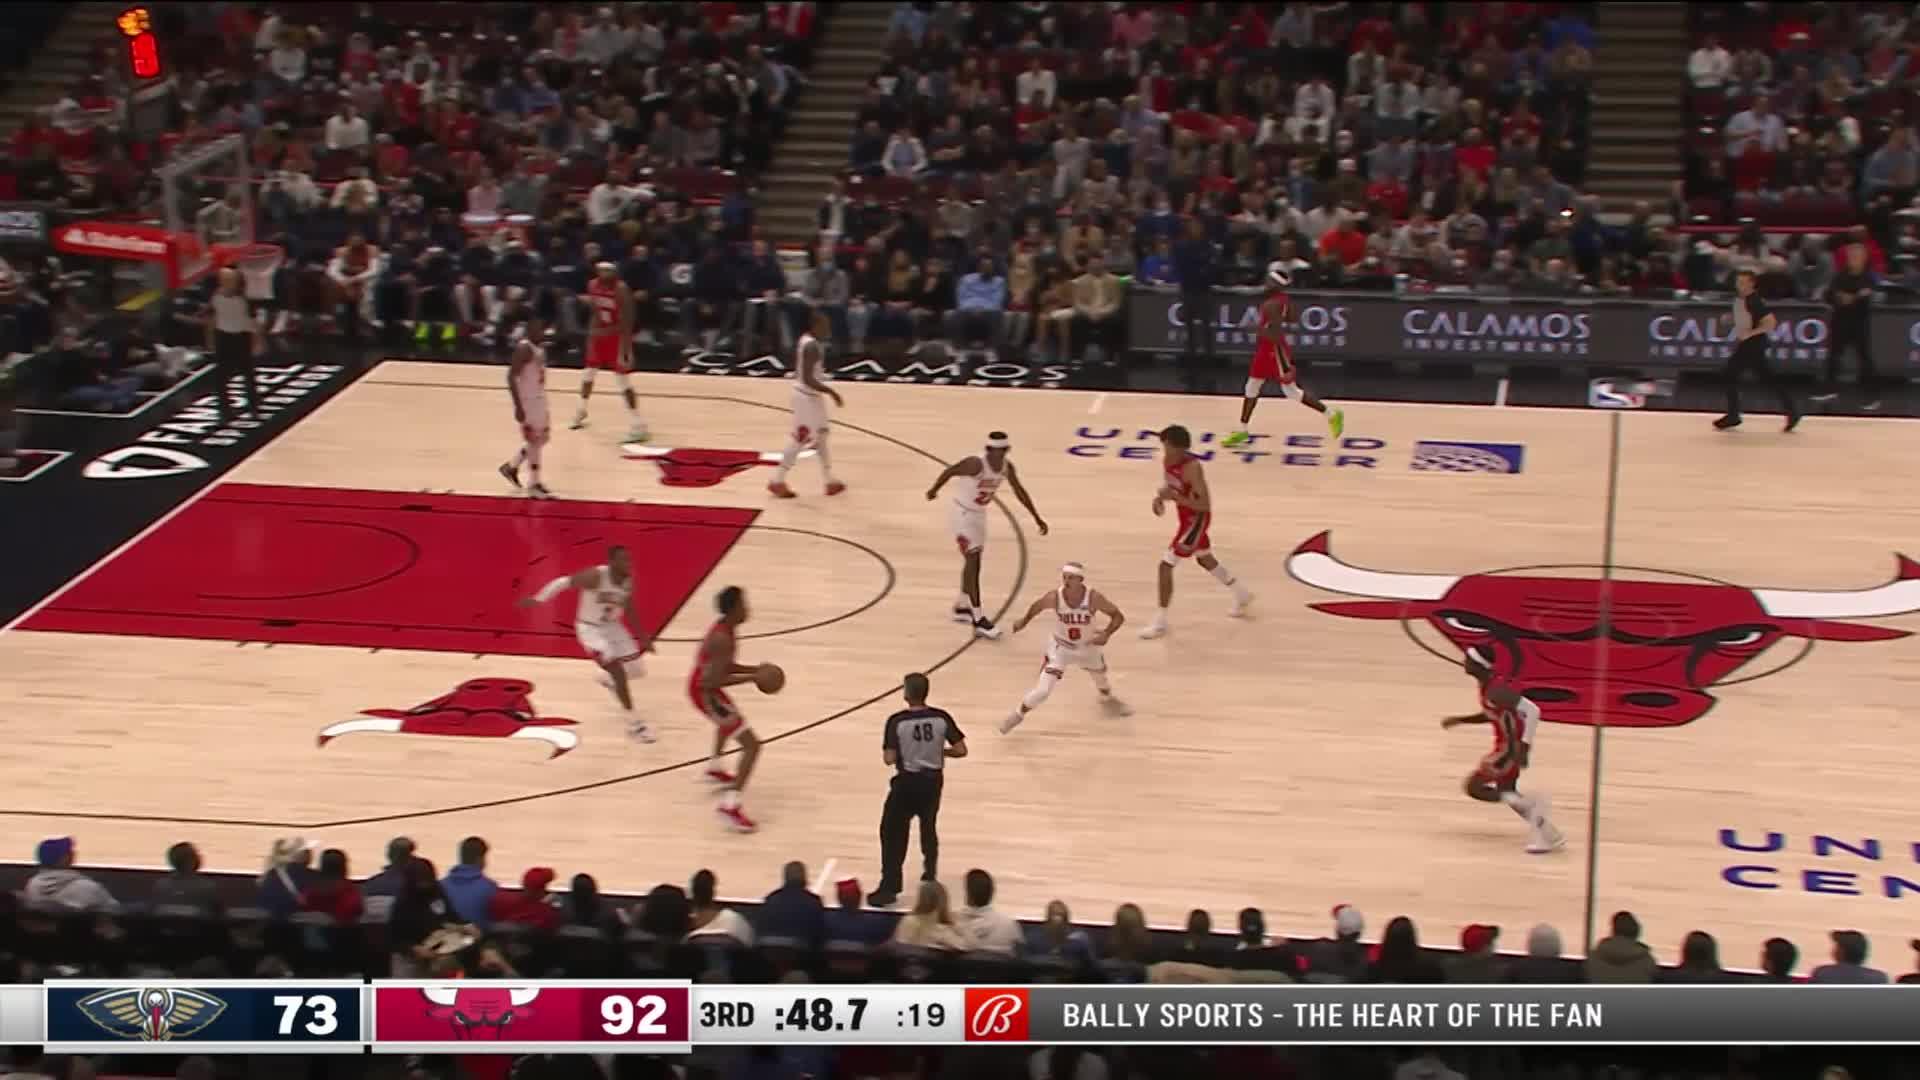 Dunk by Trey Murphy III | Pelicans at Bulls 10-22-21